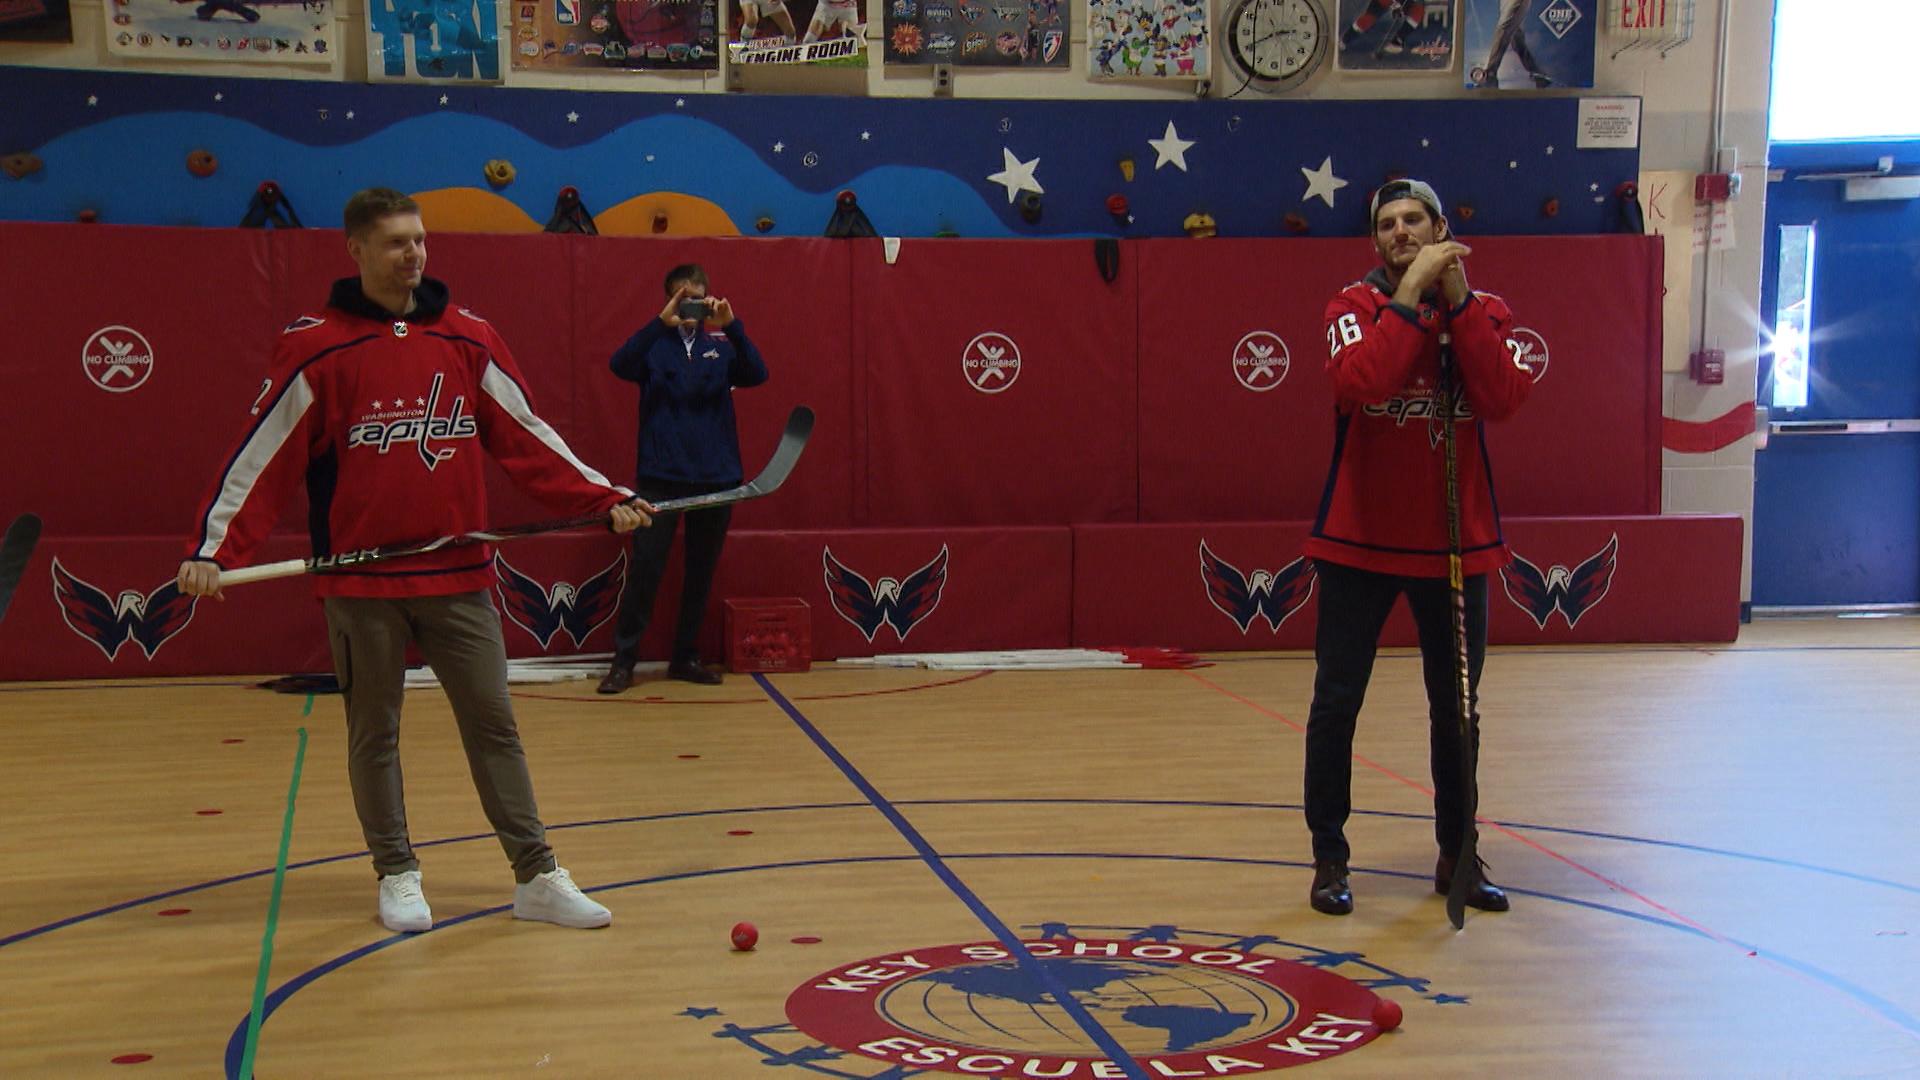 Evgeny Kuznetsov and Nic Dowd show off hockey skills at a local school